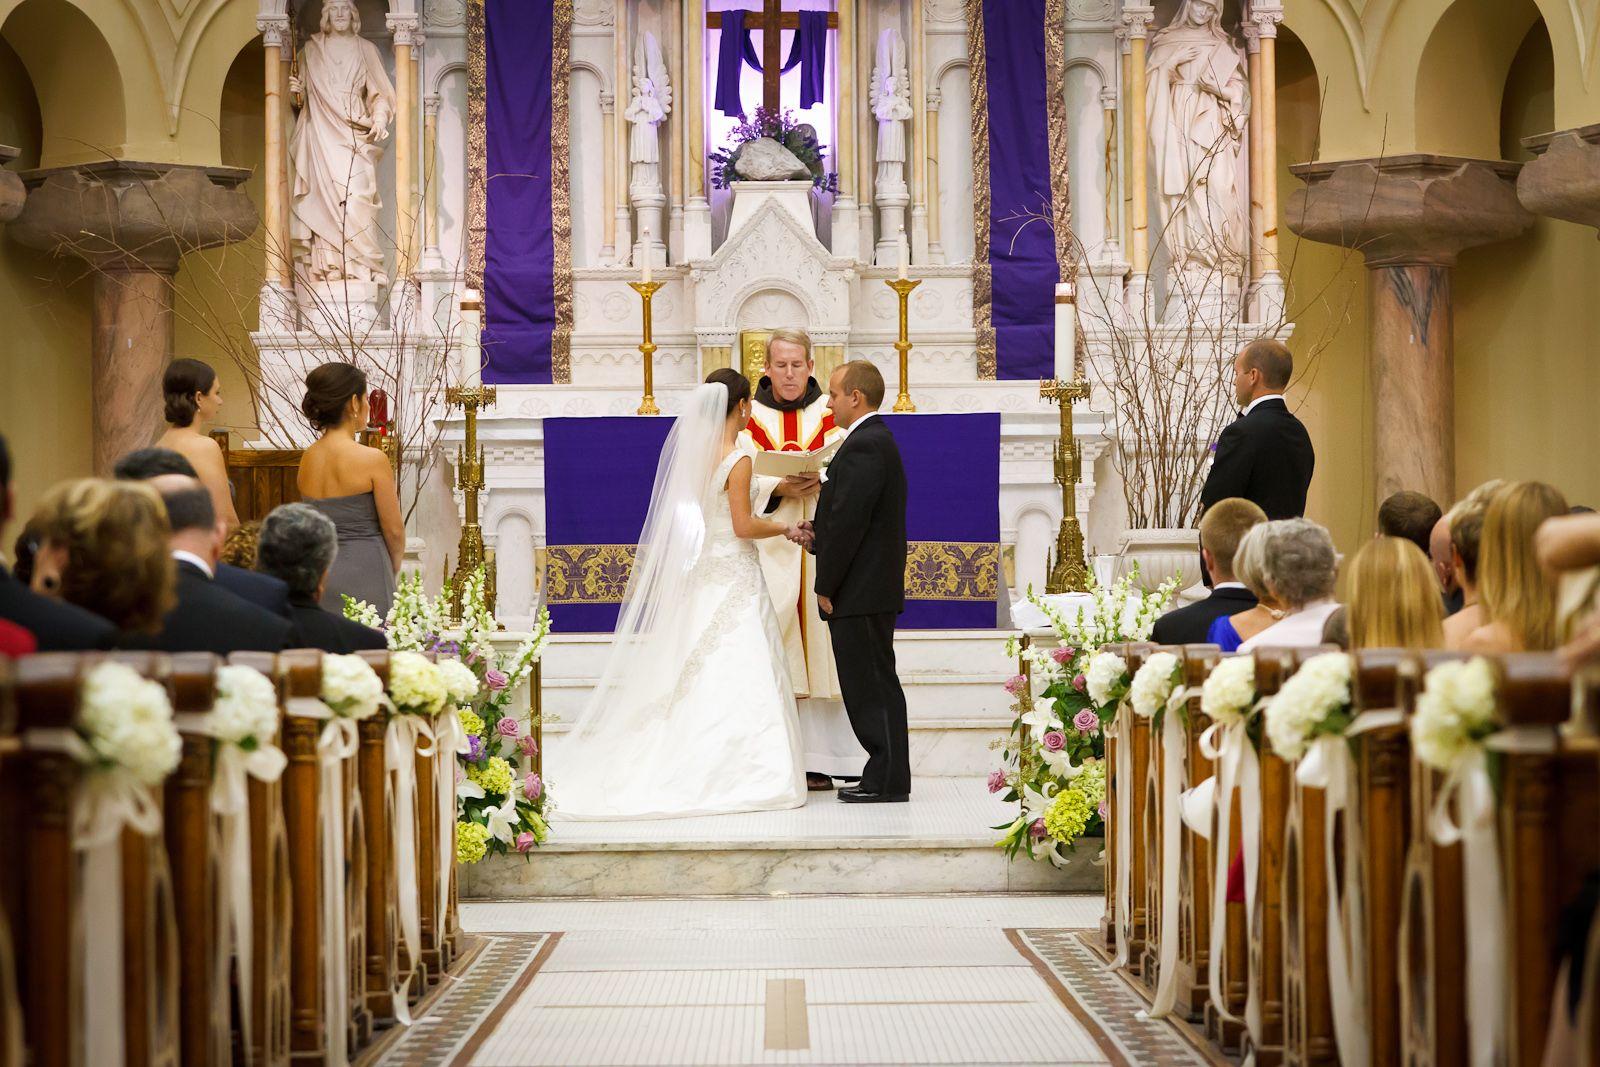 Aisle Flowers By Botanica #wedding #weddingflowers